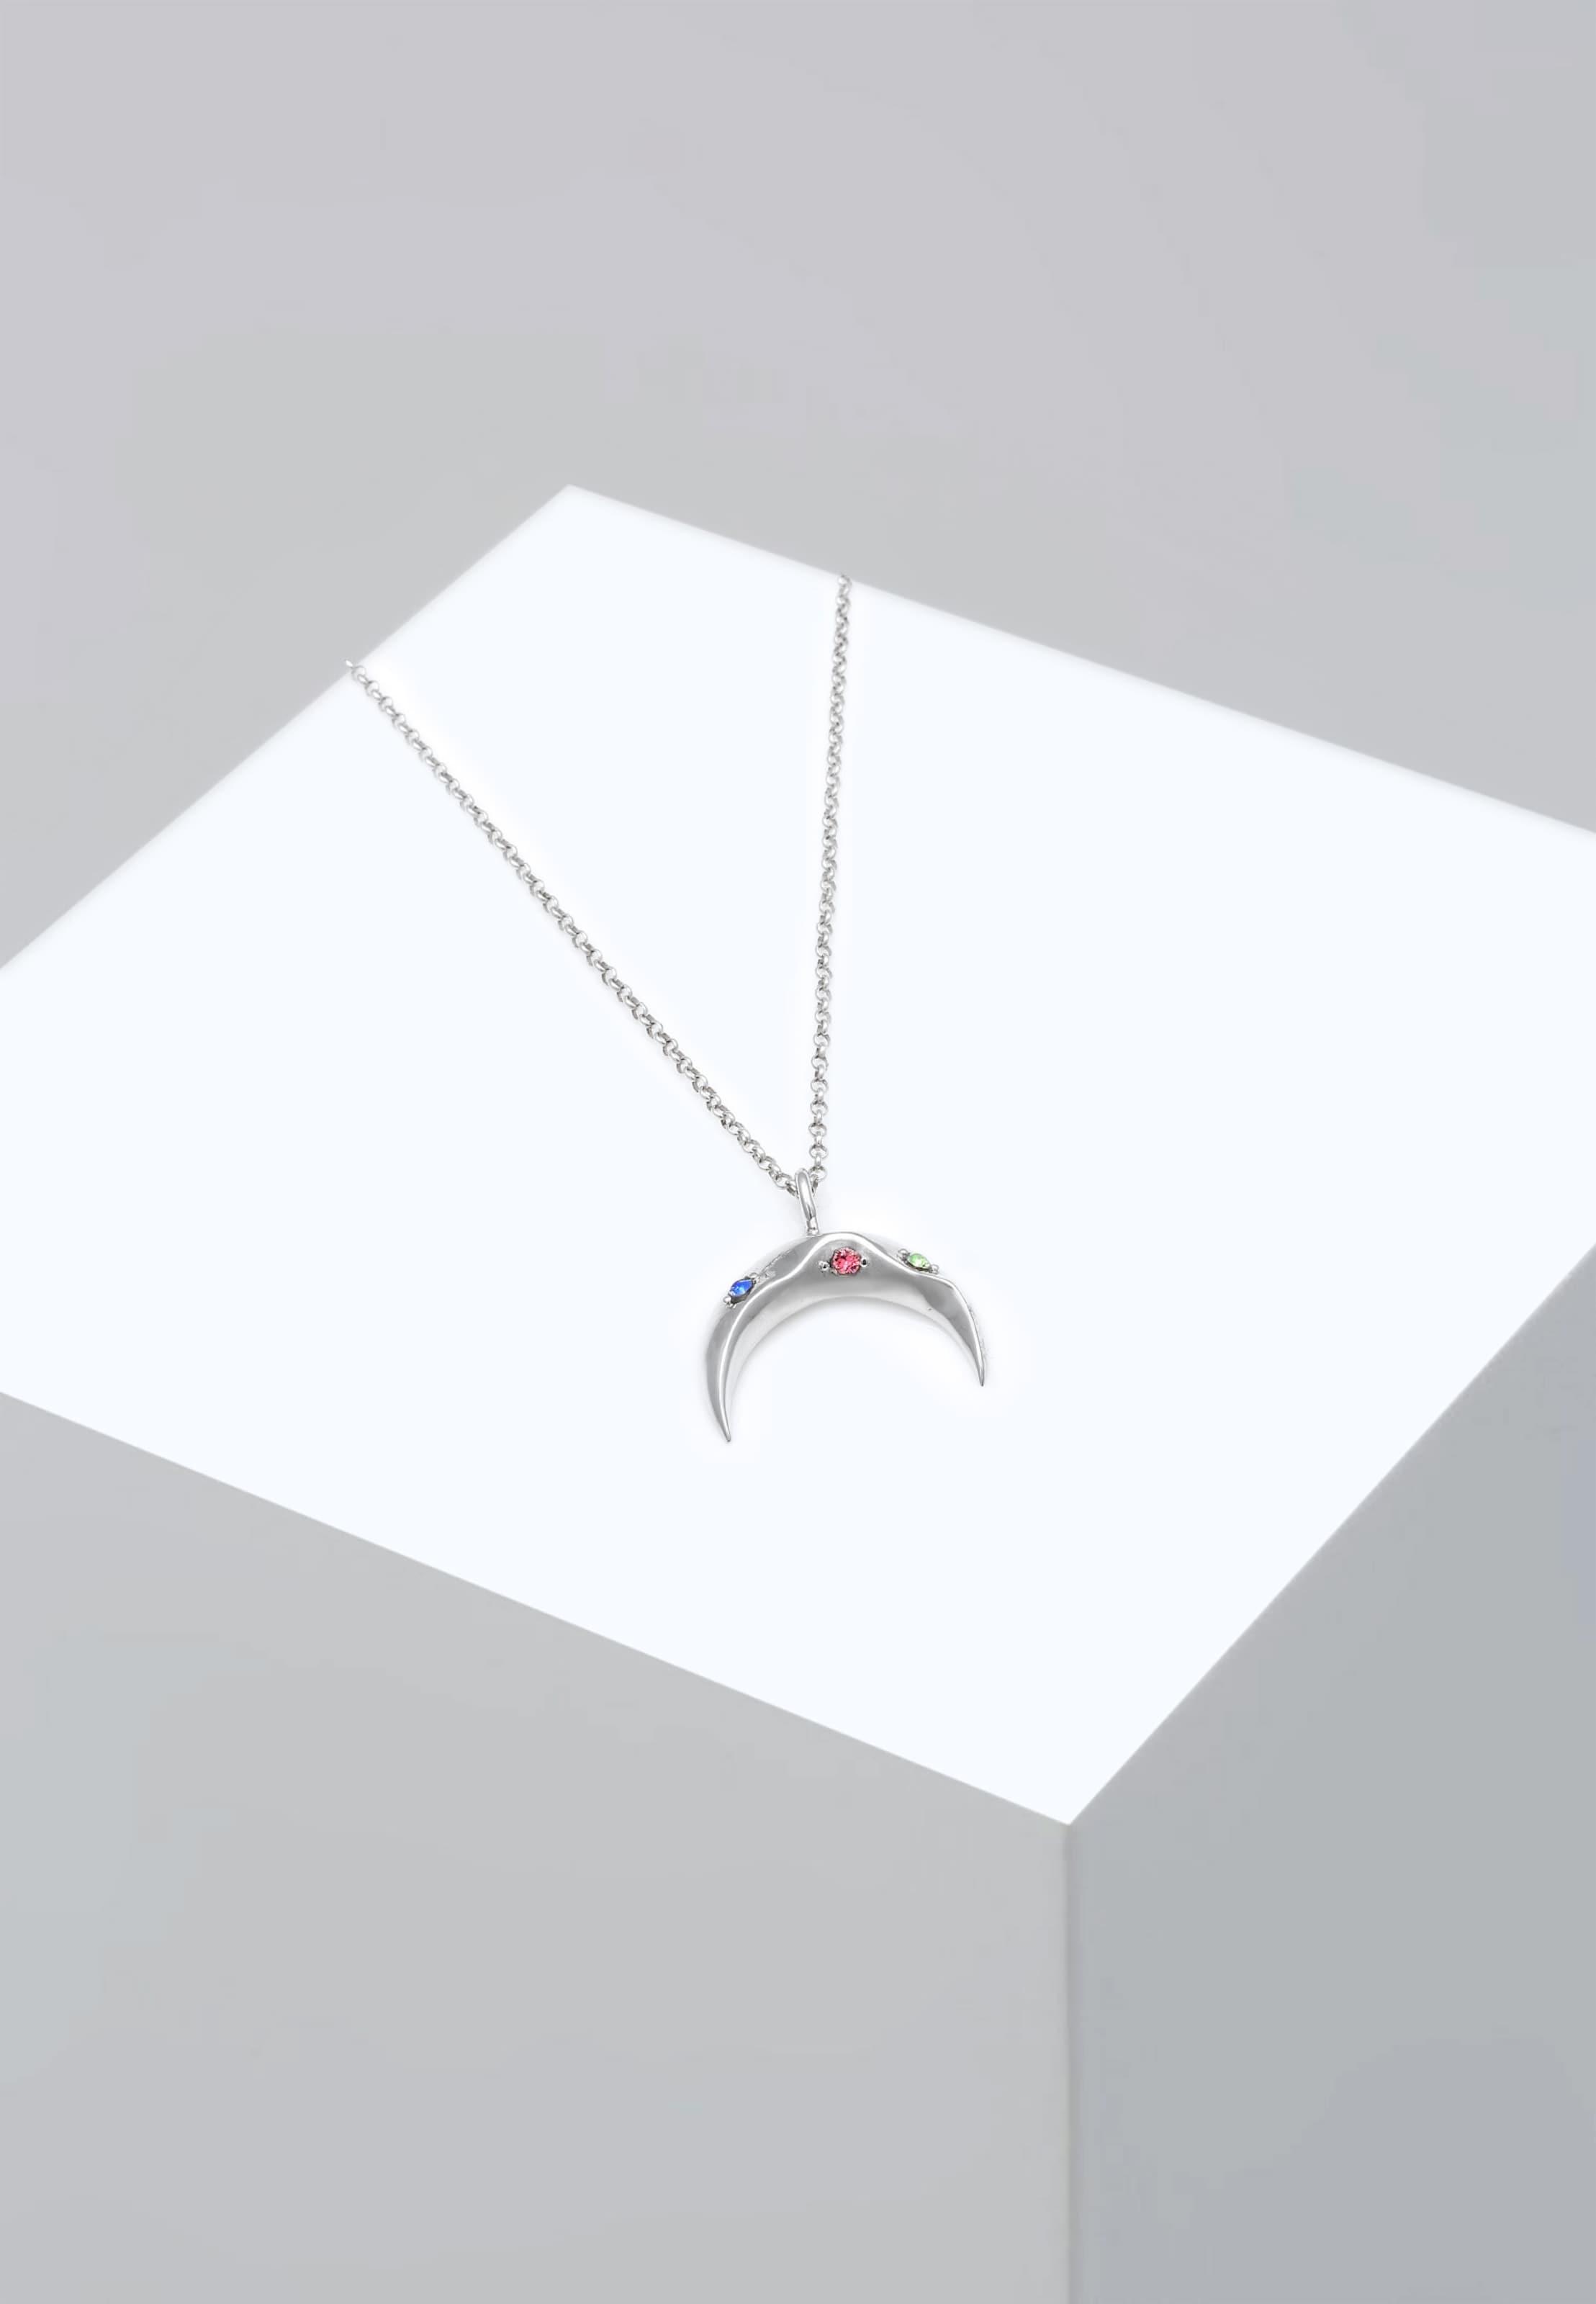 Halskette Silber Rosa Elli In HimmelblauLimette 'halbmond' Y76bfyvg